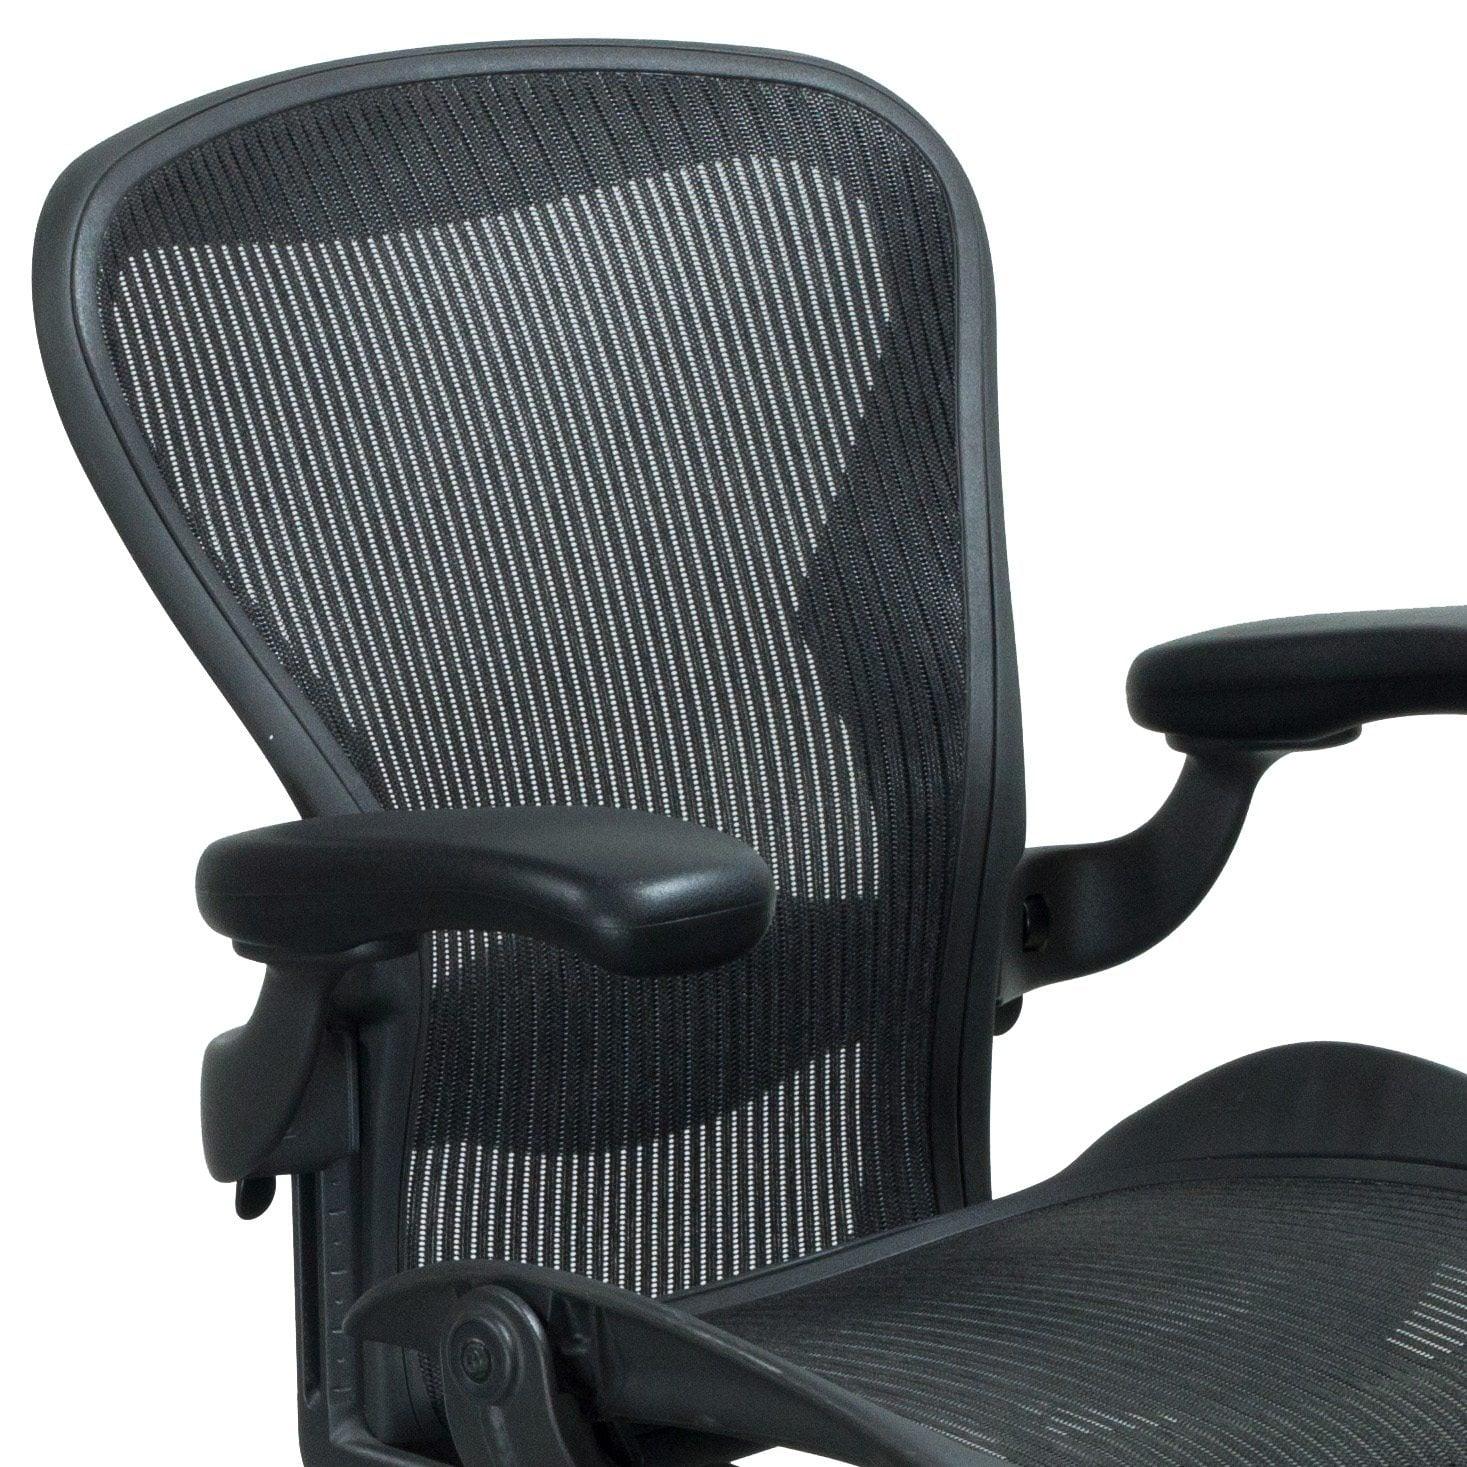 herman miller aeron used size b task chair carbon